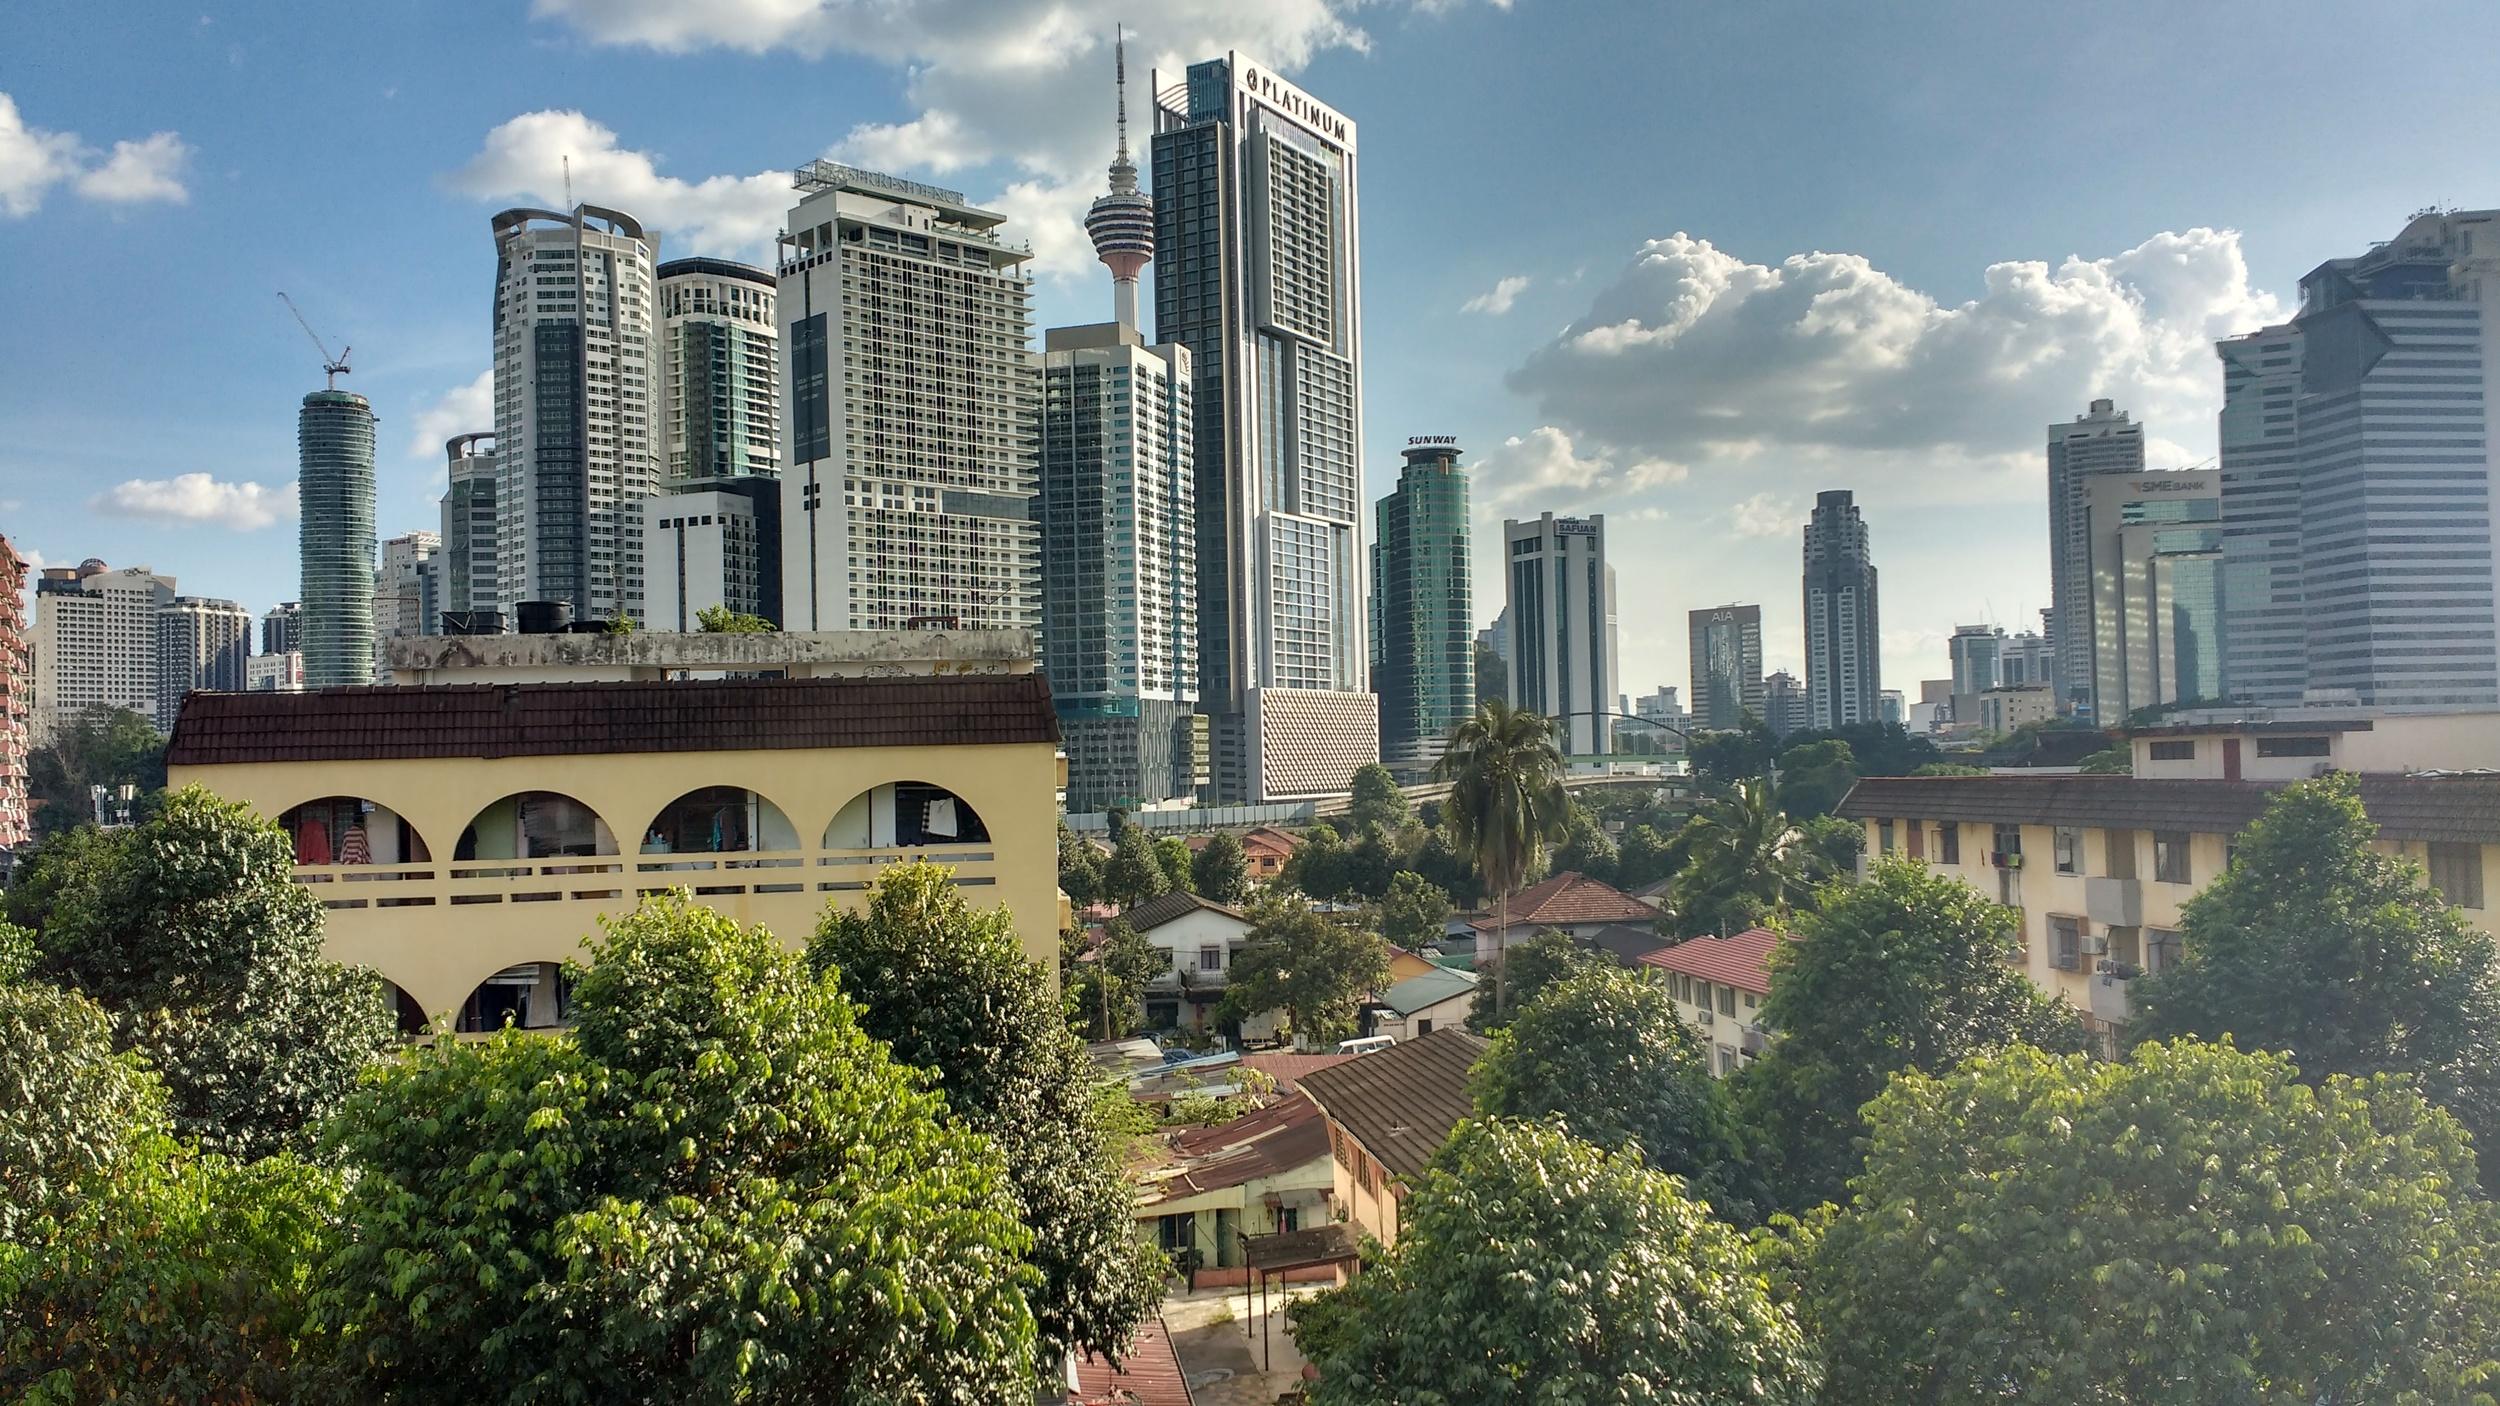 High-rise development at the edge of Kampung Bharu. Photo: Vishnu Prasad